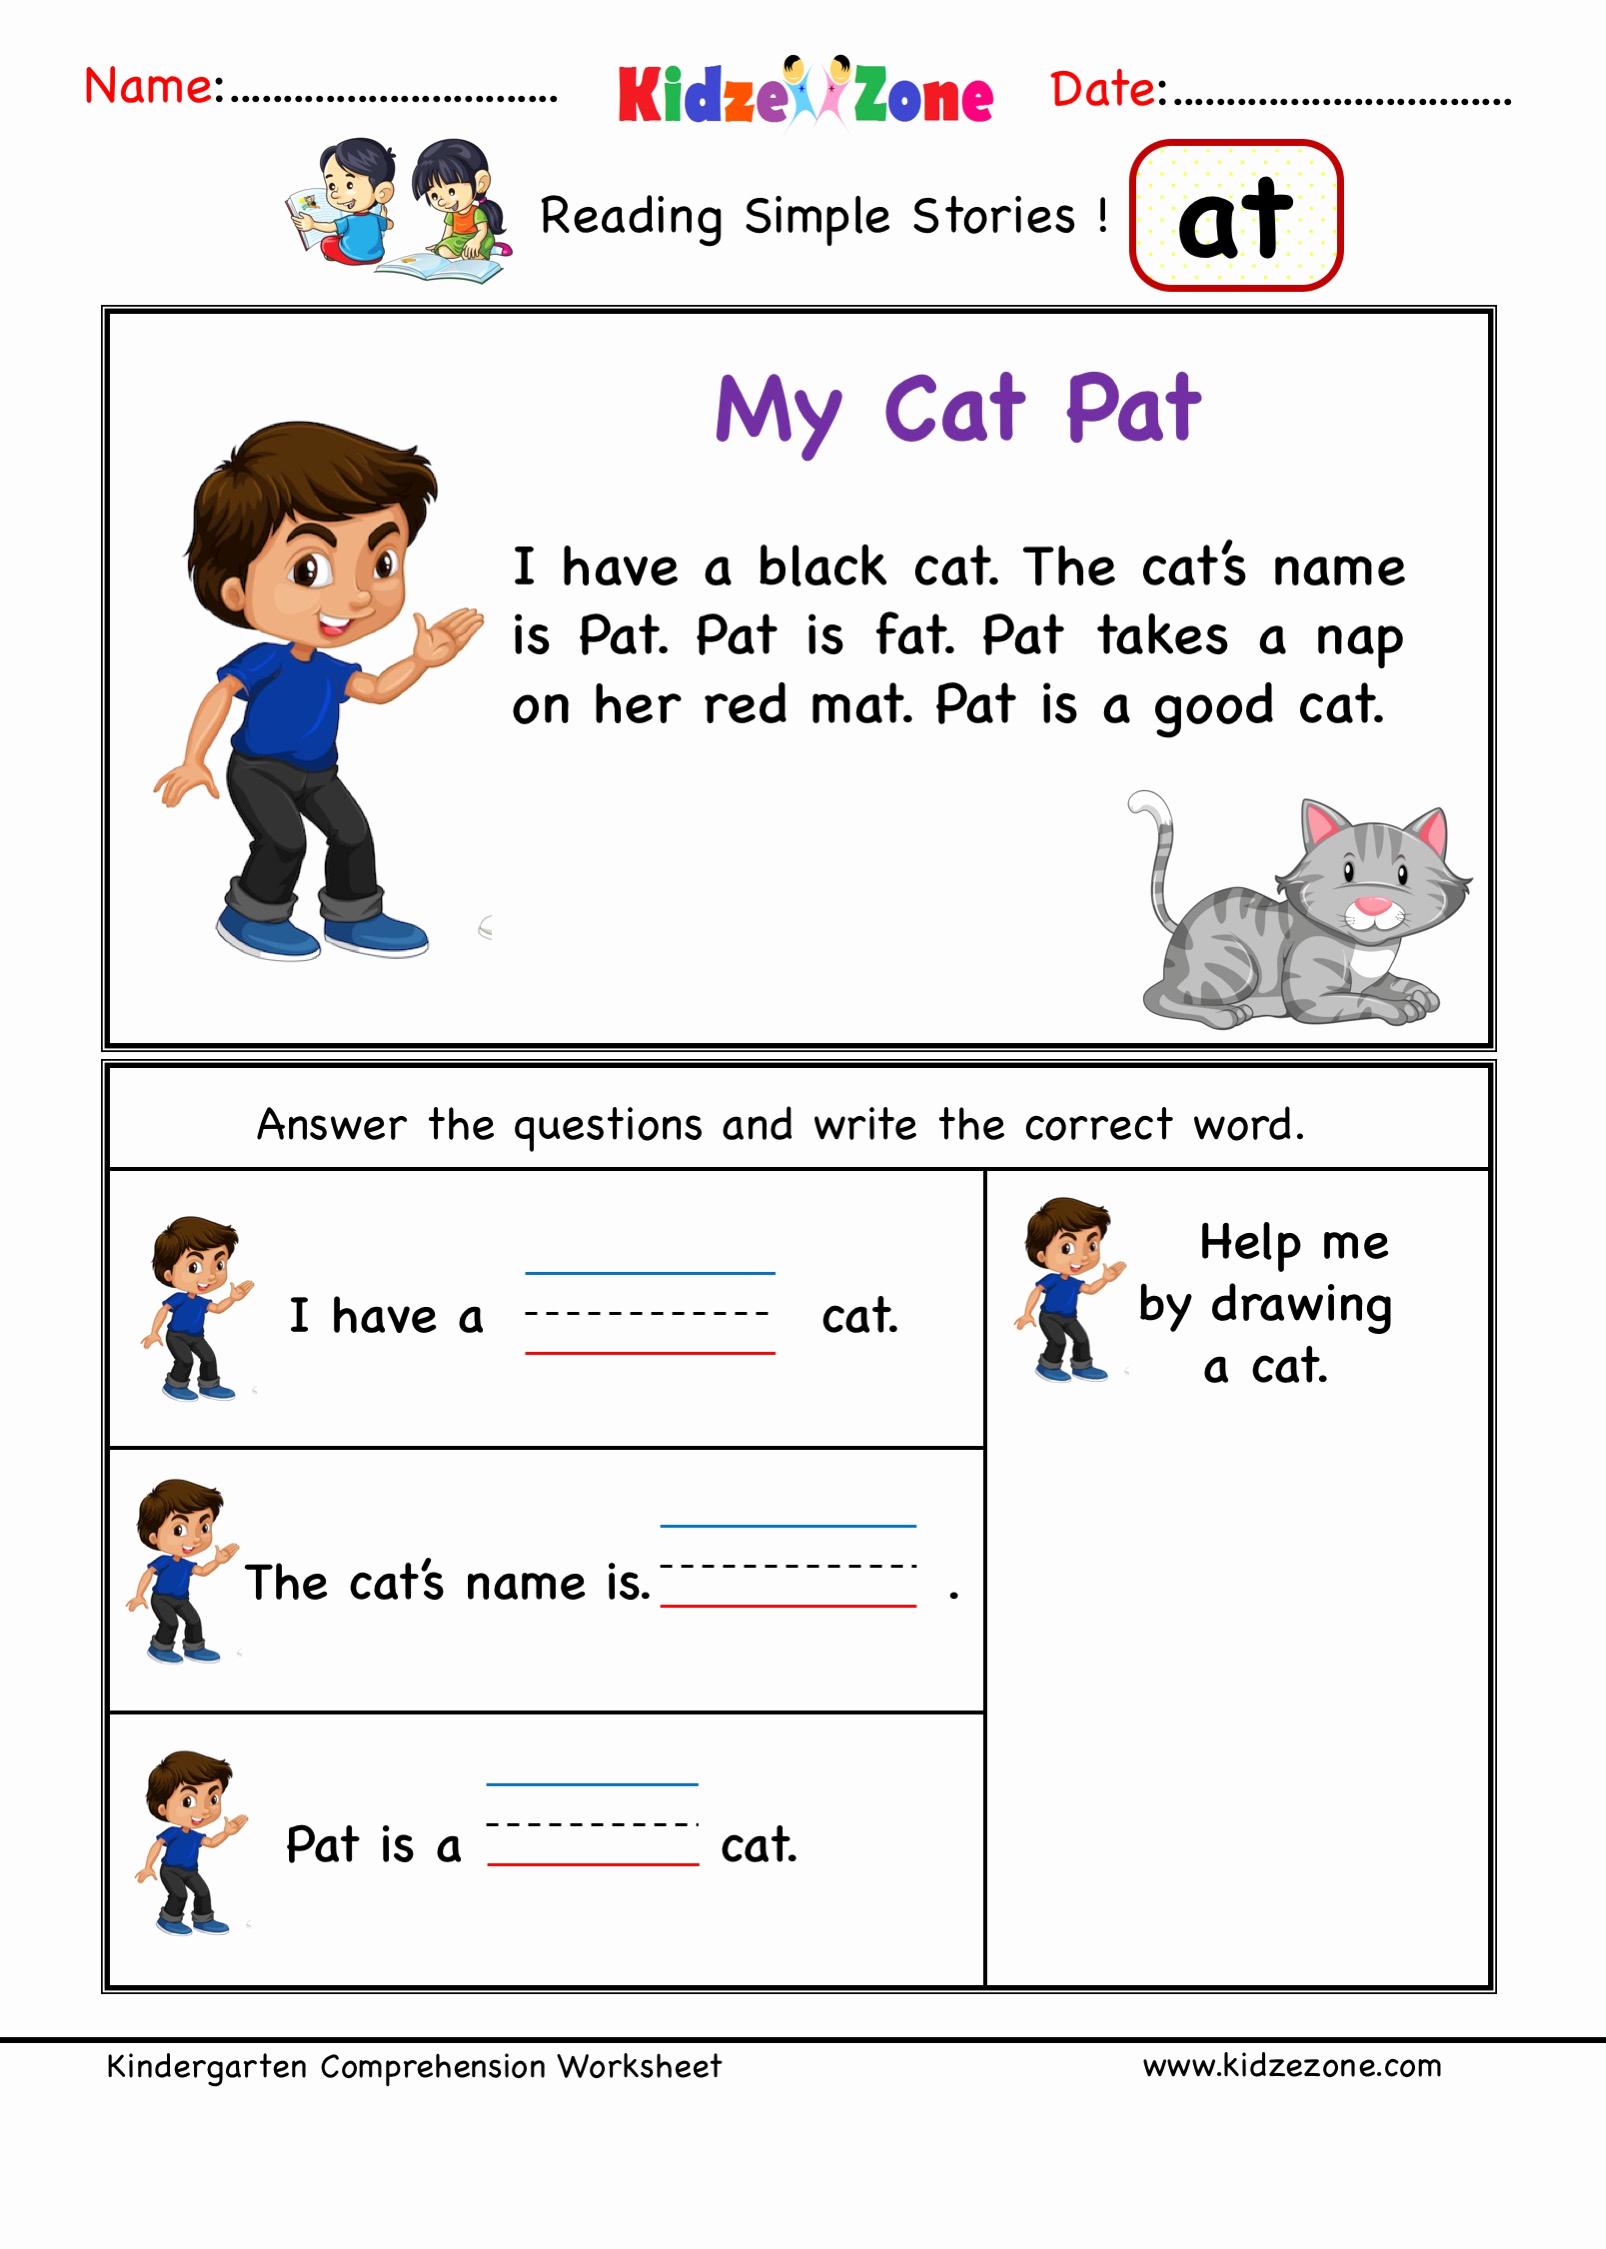 Word Family Worksheet Kindergarten Best Of Kindergarten Worksheets at Word Family Reading